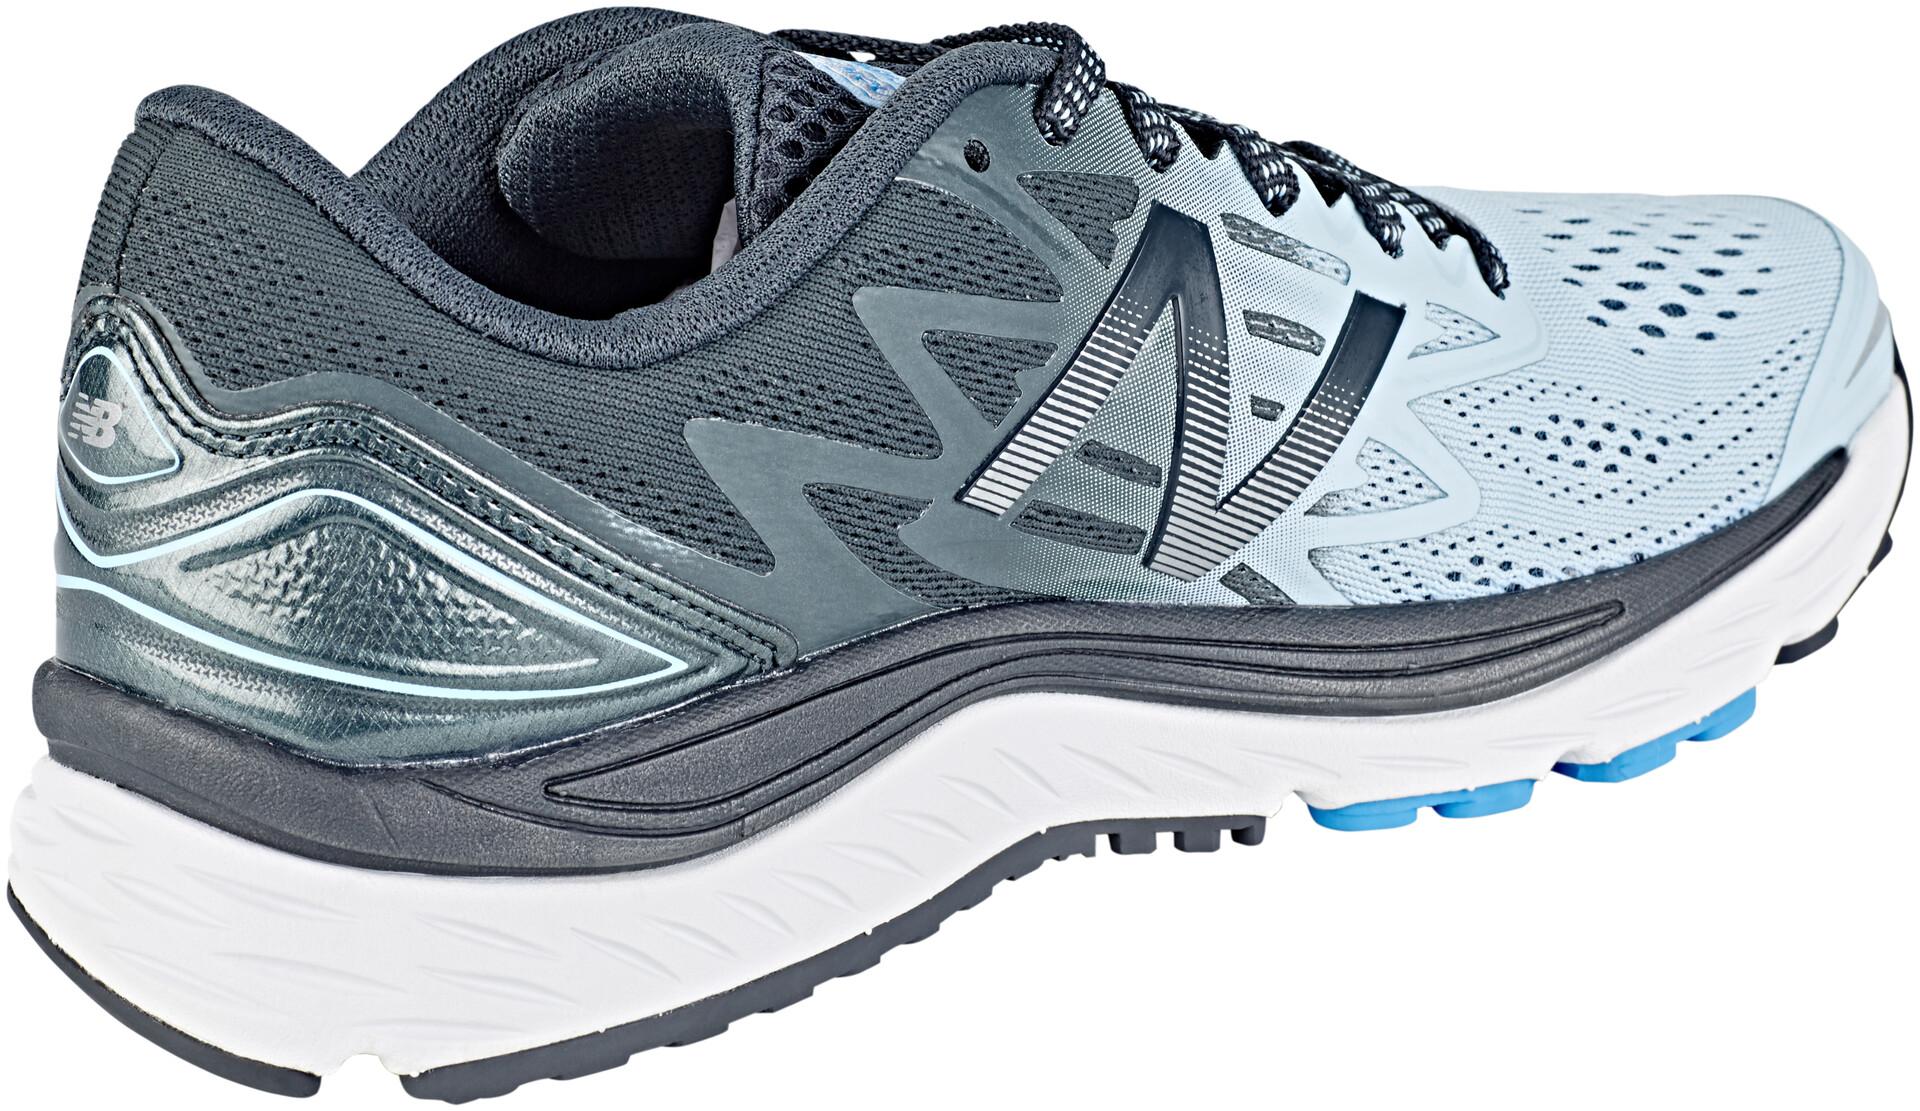 New Balance Solvi Shoes Damen blueblack